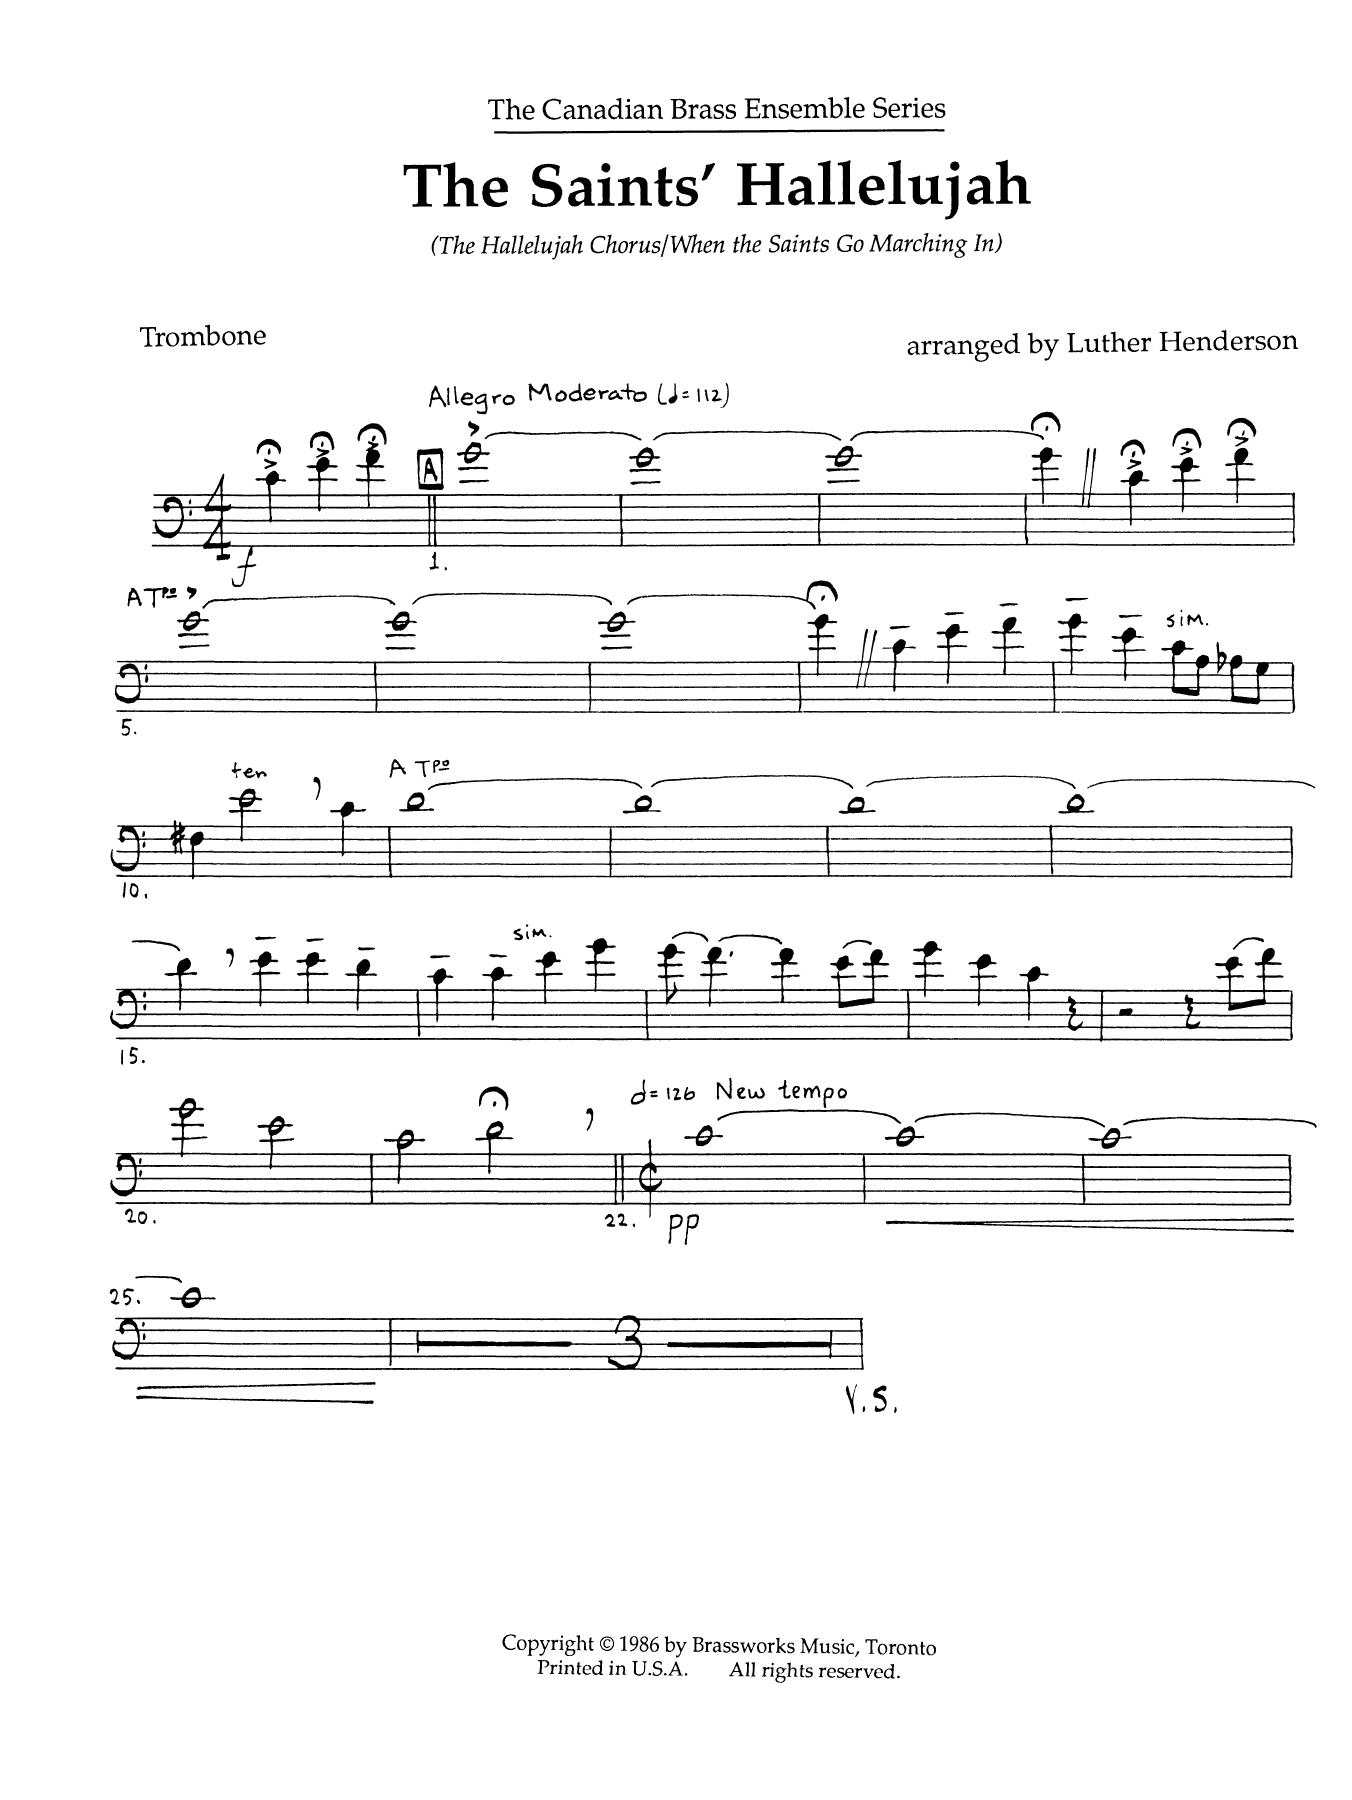 The Saints' Hallelujah - Trombone (B.C.) Sheet Music